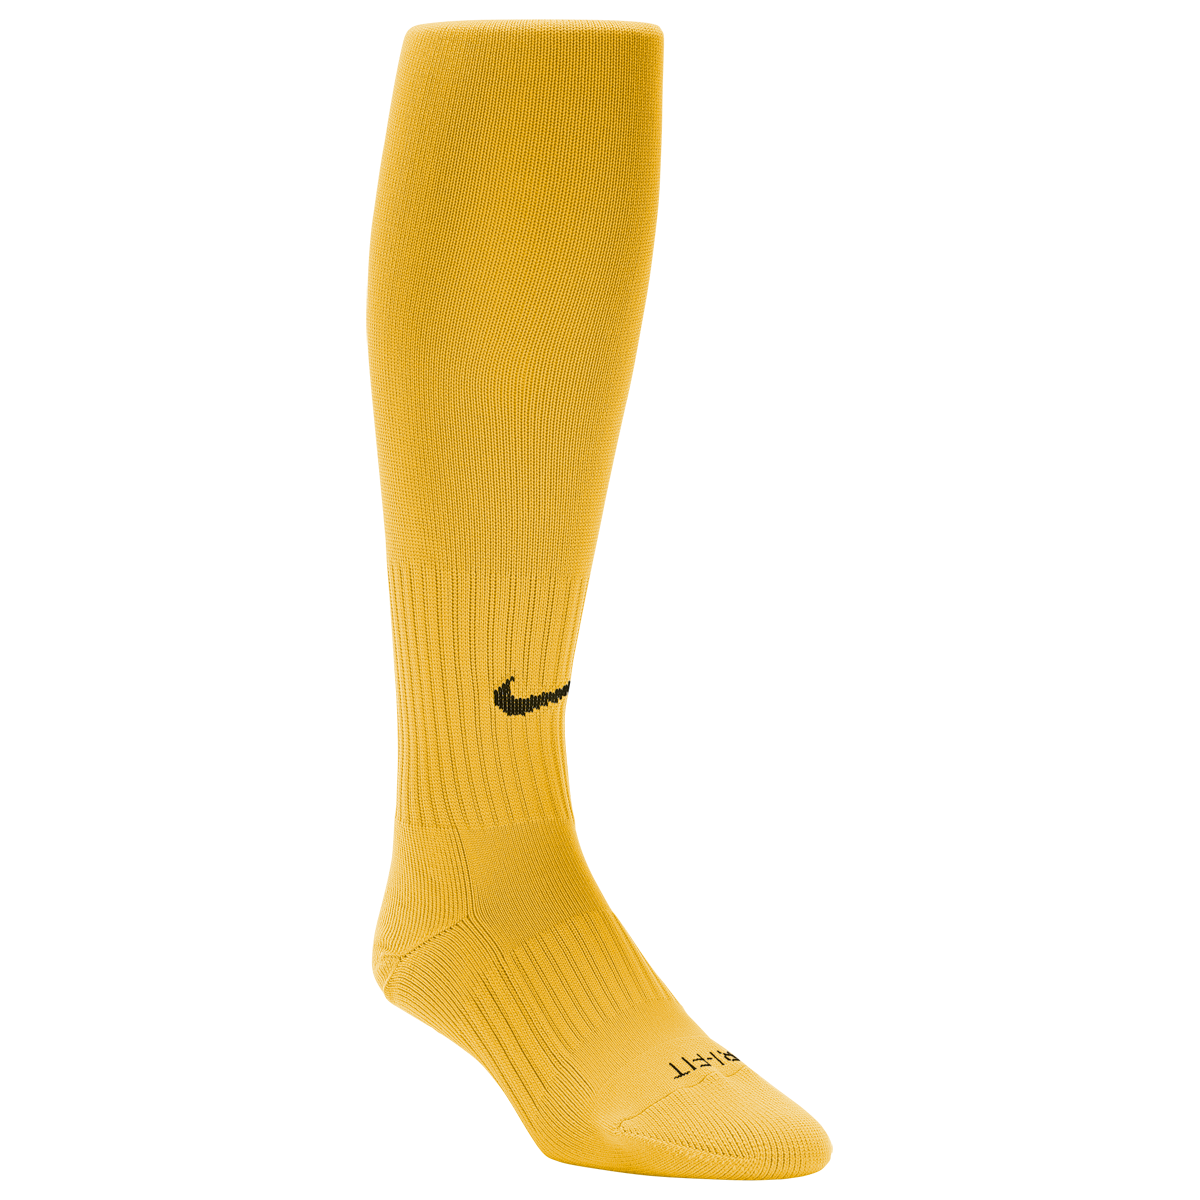 Nike Classic Soccer Socks Yellow Black L Soccer Socks Socks Nike